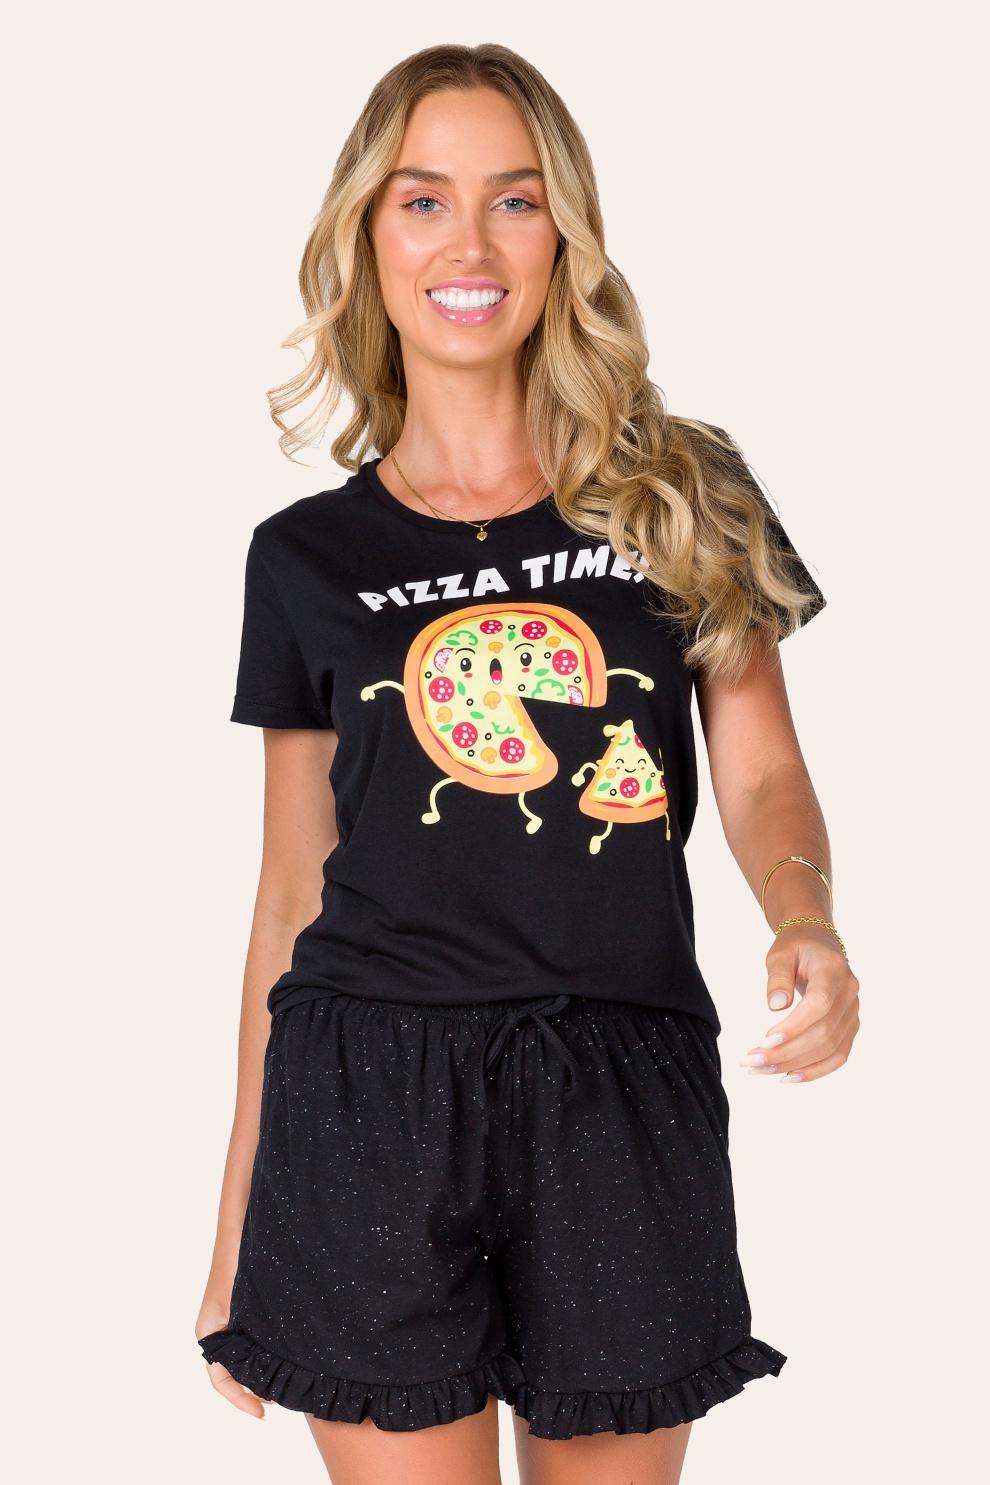 041/A - Pijama Adulto Feminino  Pizza Time - Família